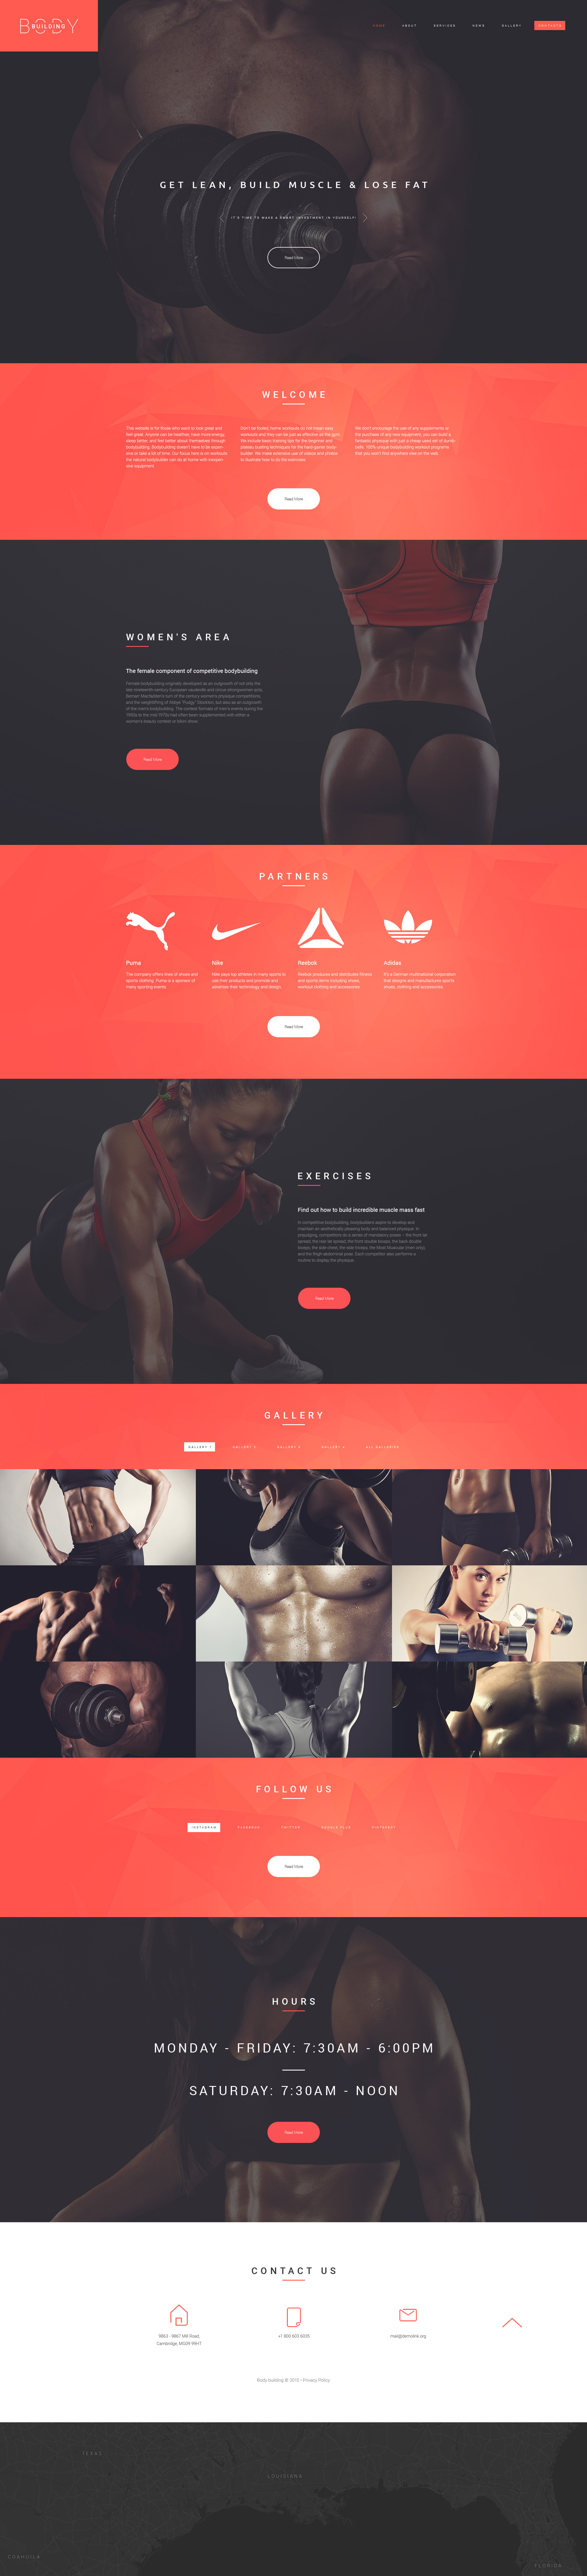 "Website Vorlage namens ""Bodybuilders' Club"" #55451"